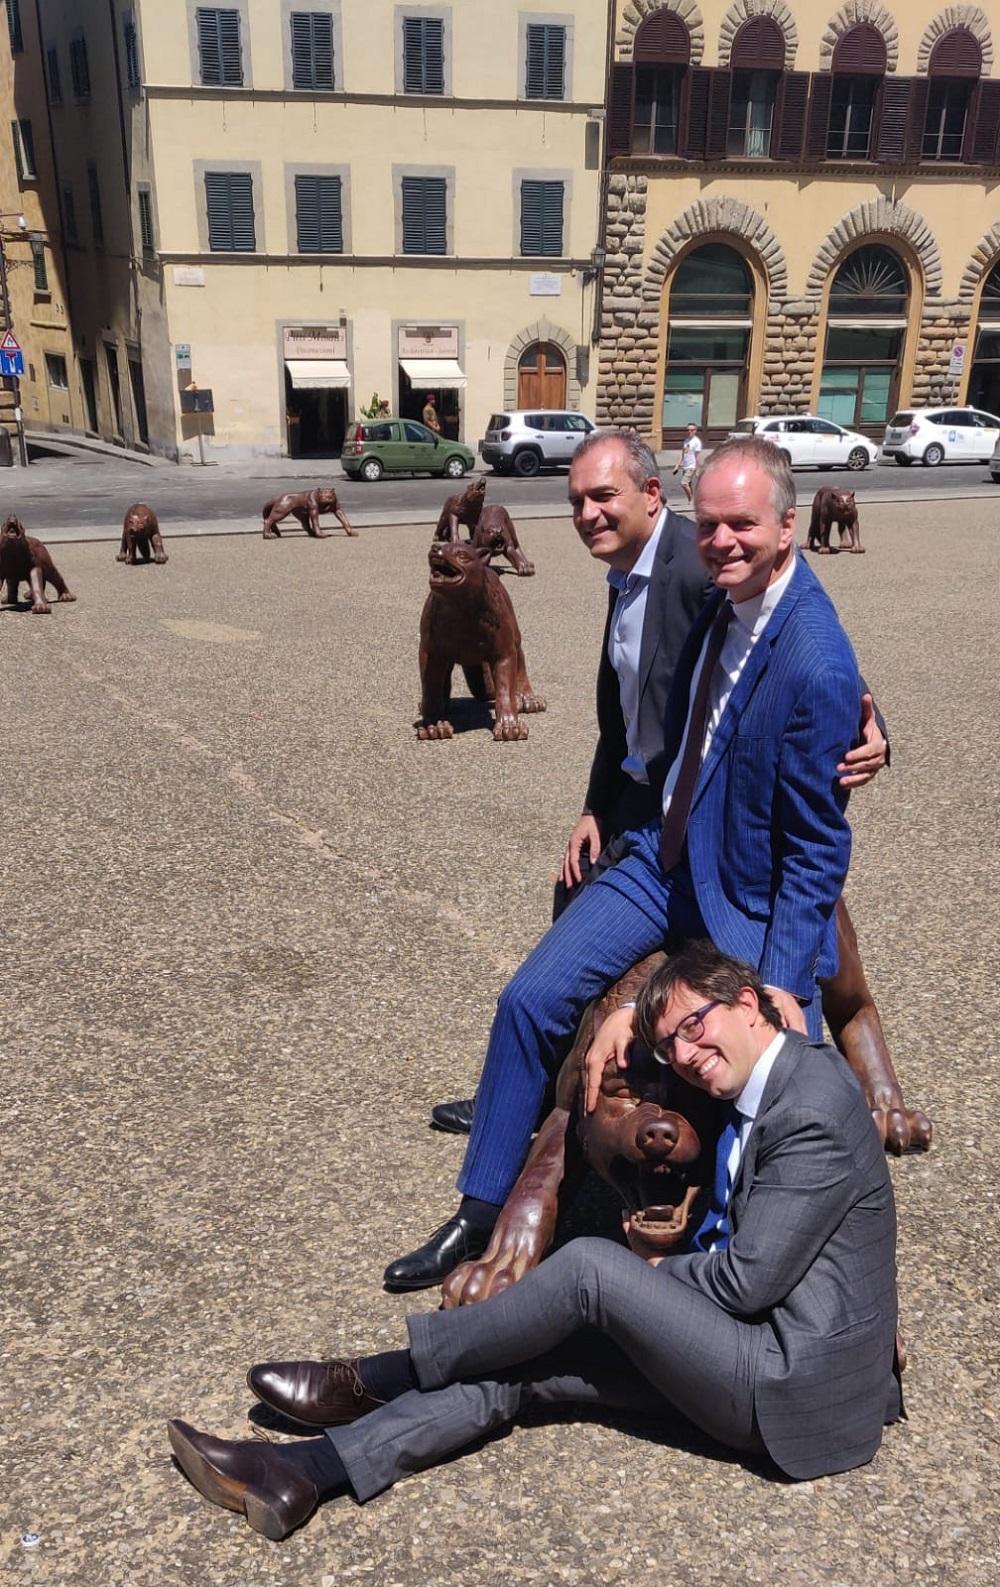 Dario Nardella, Eike Schmidt, Luigi de Magistris con i lupi di Firenze